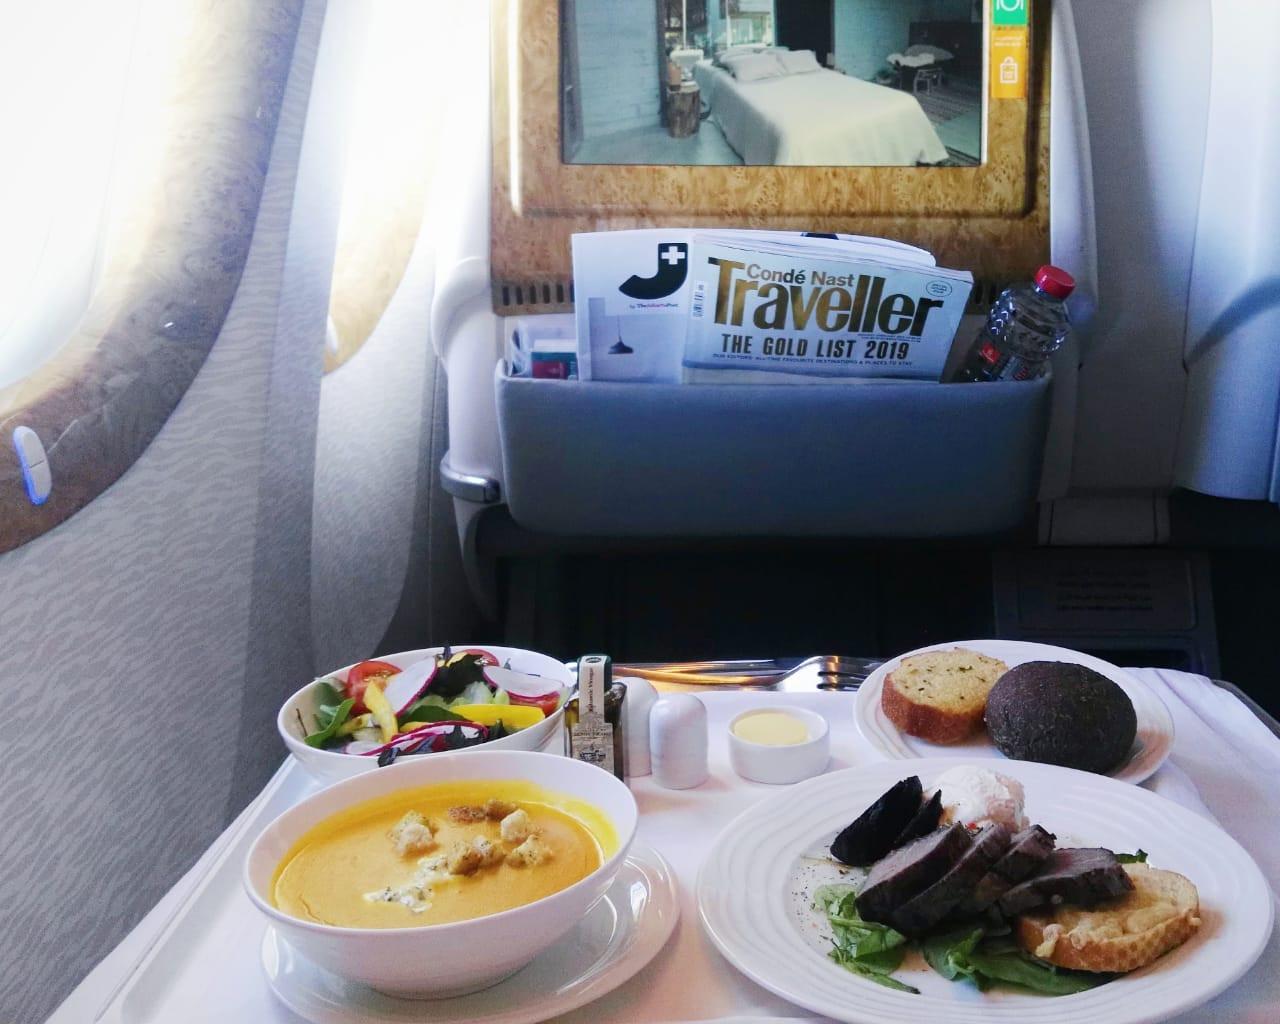 Appetizers aboard EK451 Auckland-Denpasar